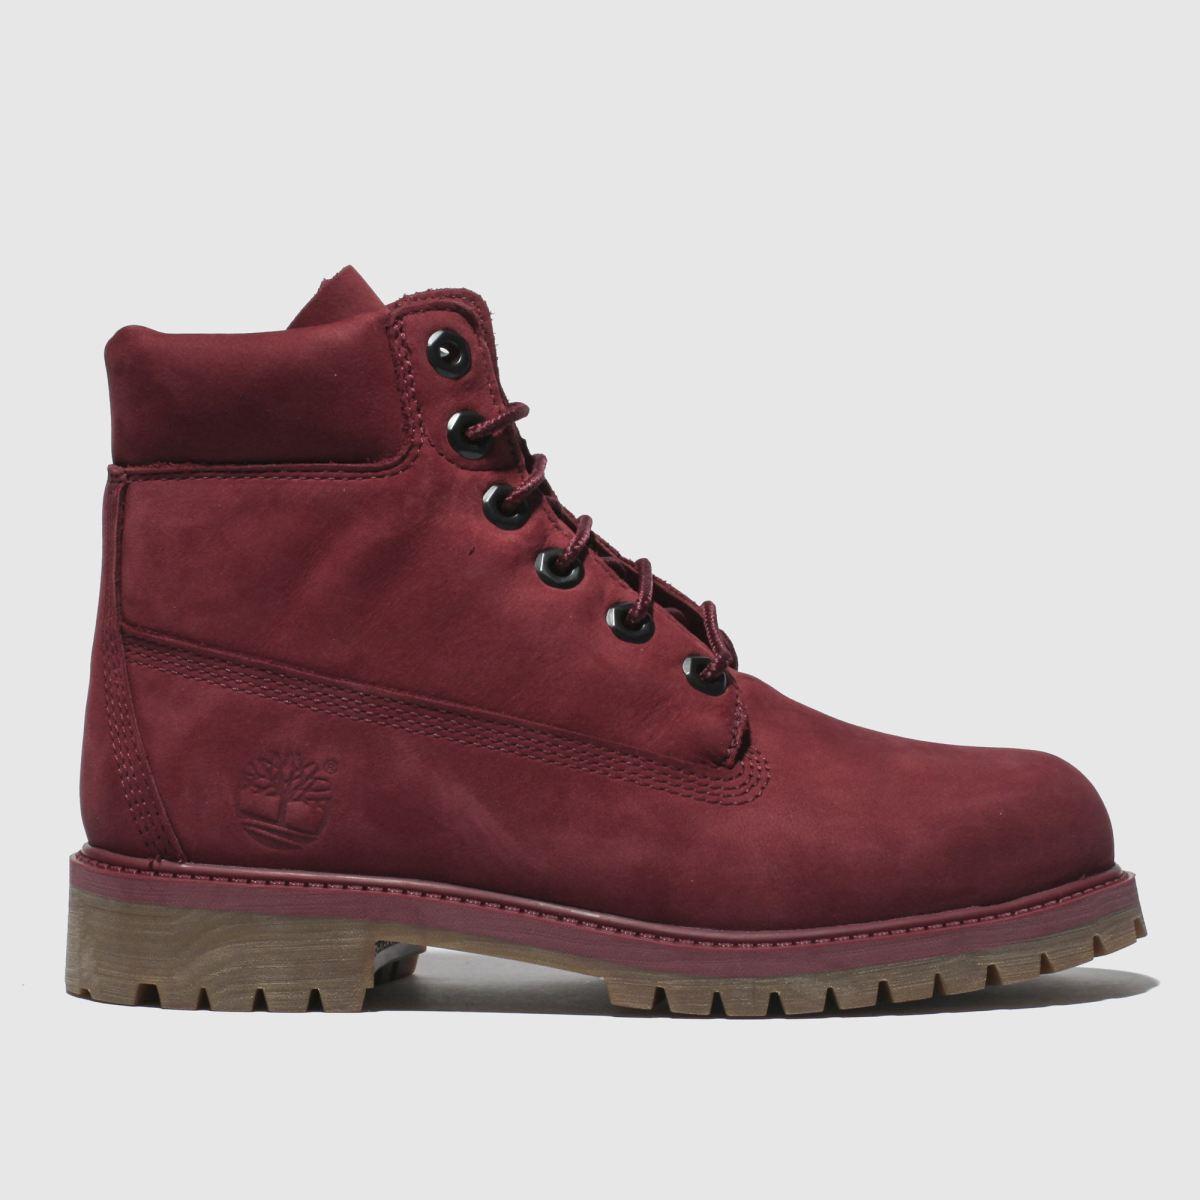 Timberland Burgundy Timb Inch Premium Boots Youth